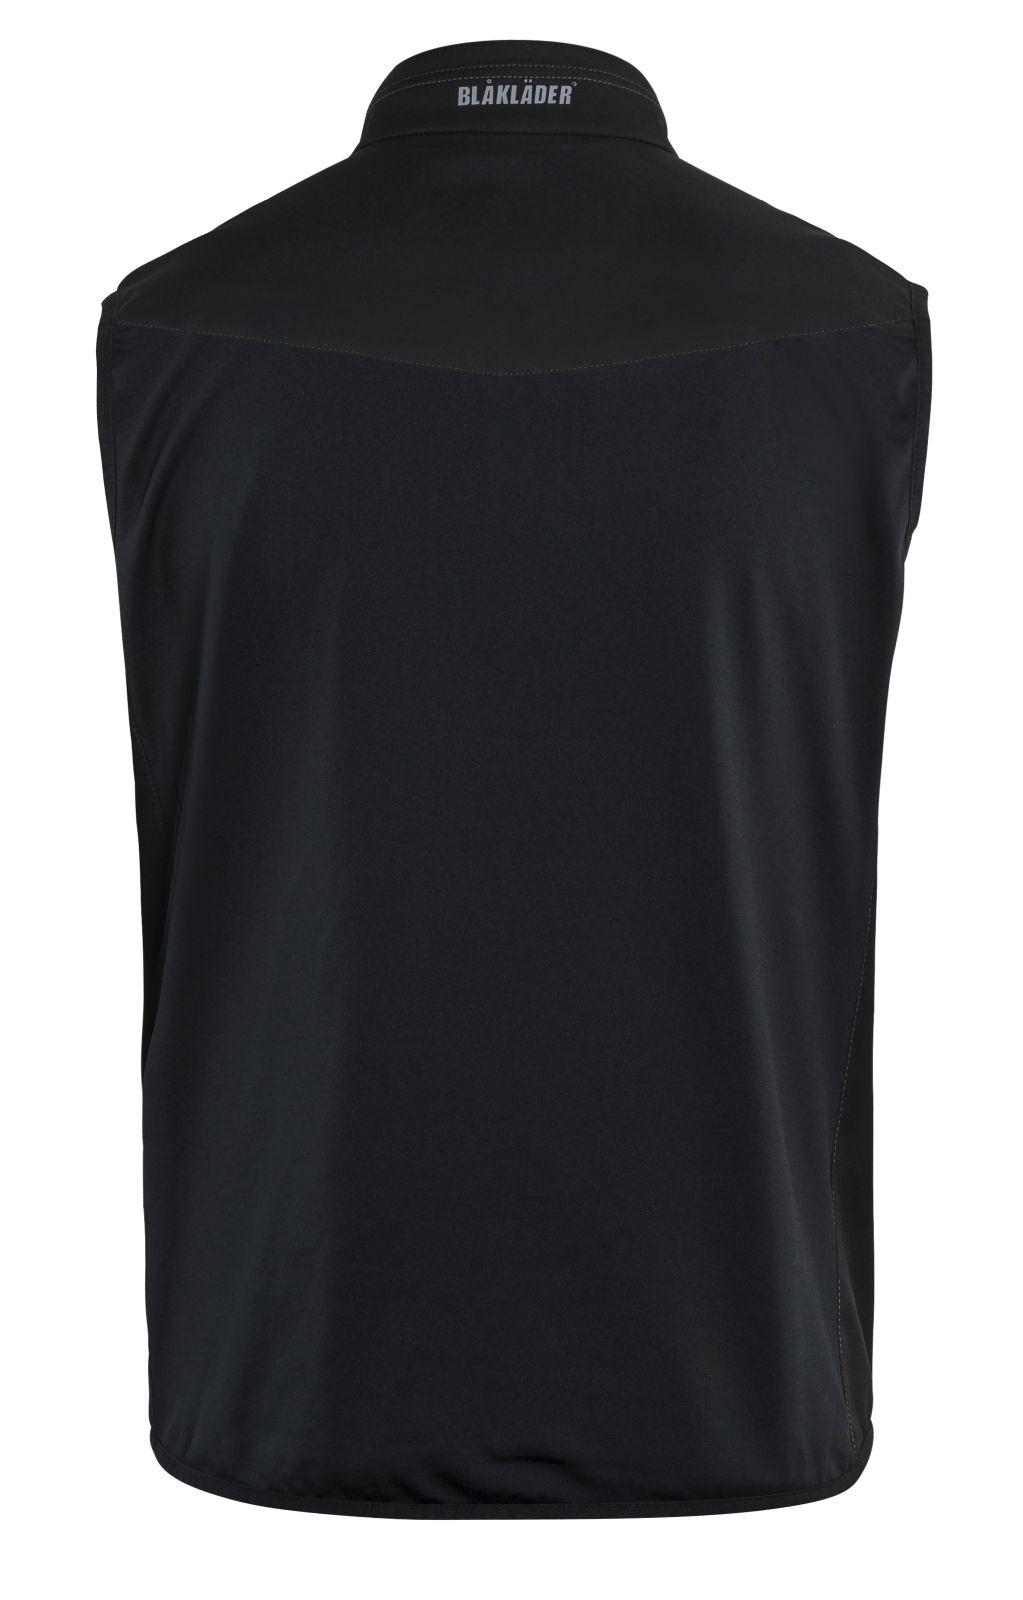 Blaklader Softshell bodywarmers 38502516 zwart-grijs(9998)